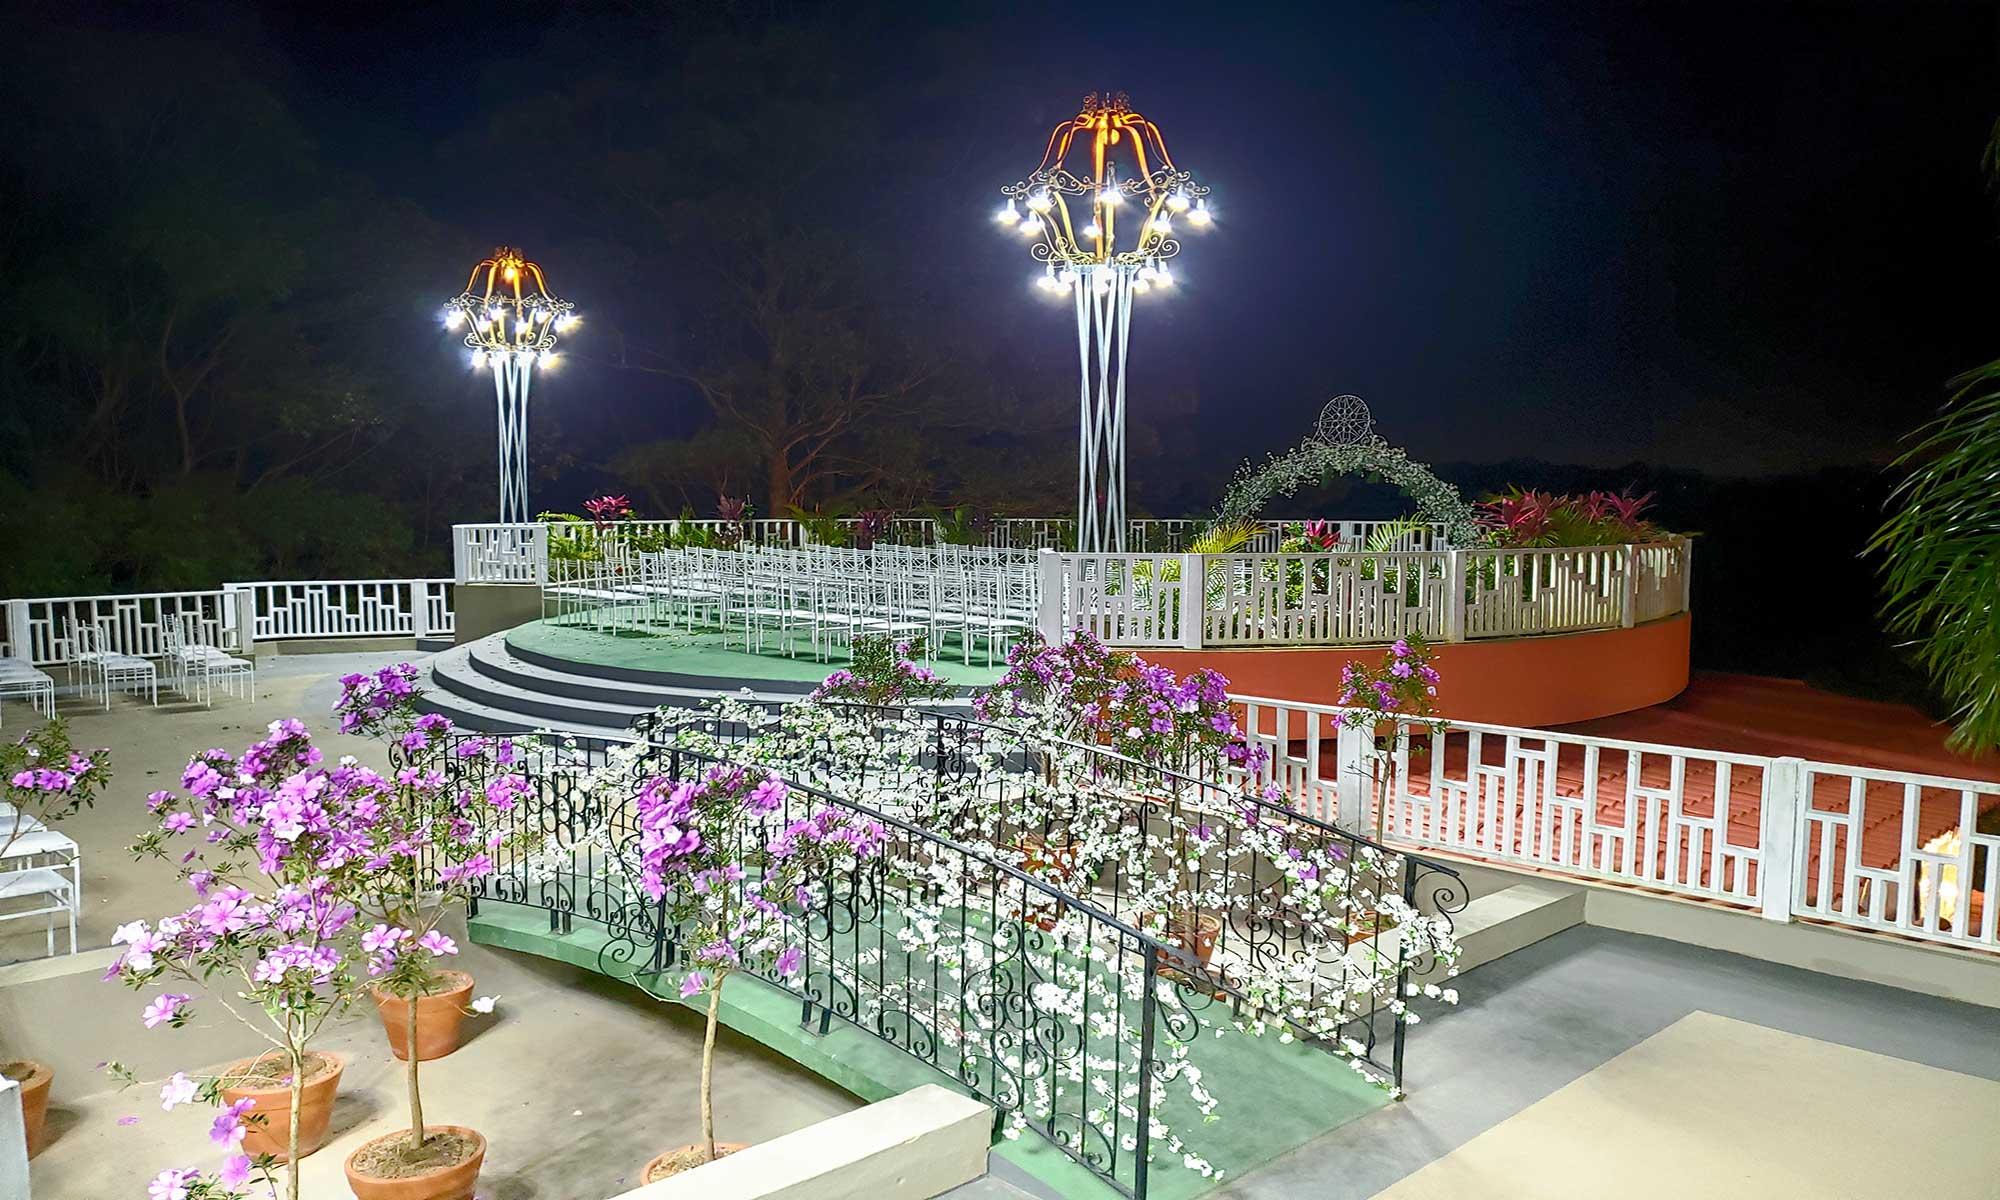 83533-giardinodigiacomo-giardino-di-giacomo-festas-dj-sp